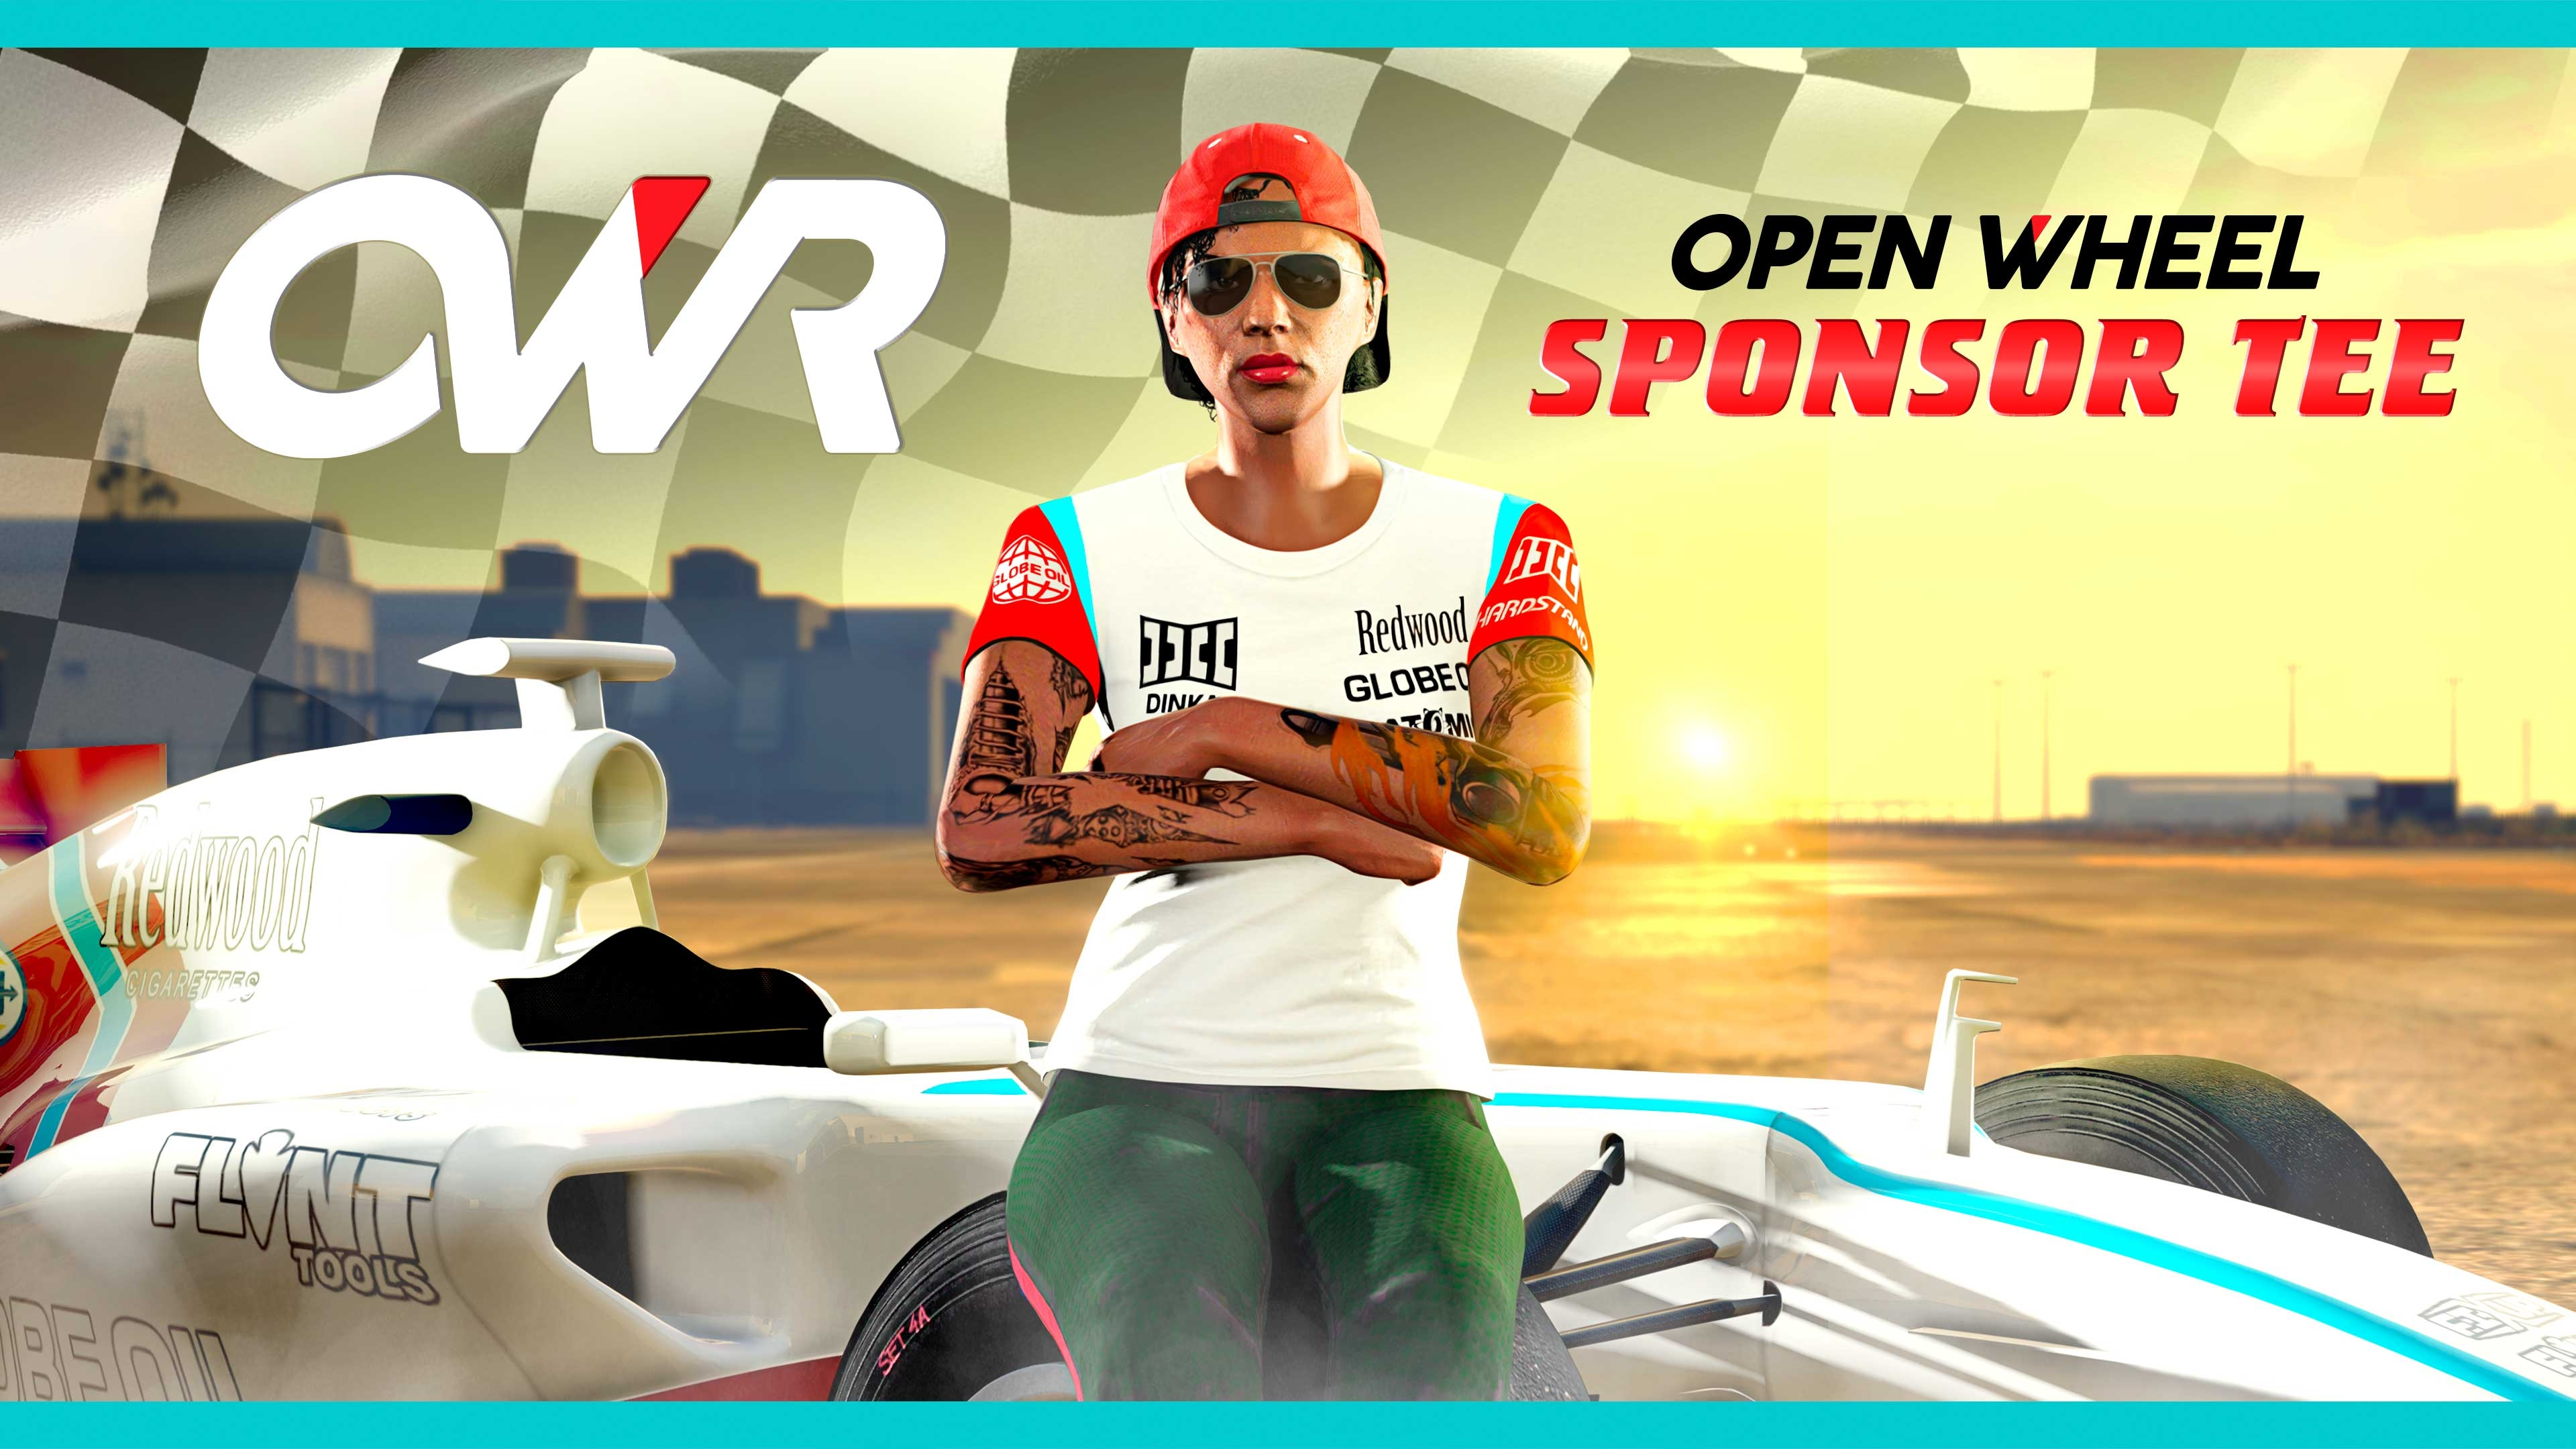 Free Open Wheel Sponsor Shirt for All Open Wheel Racers